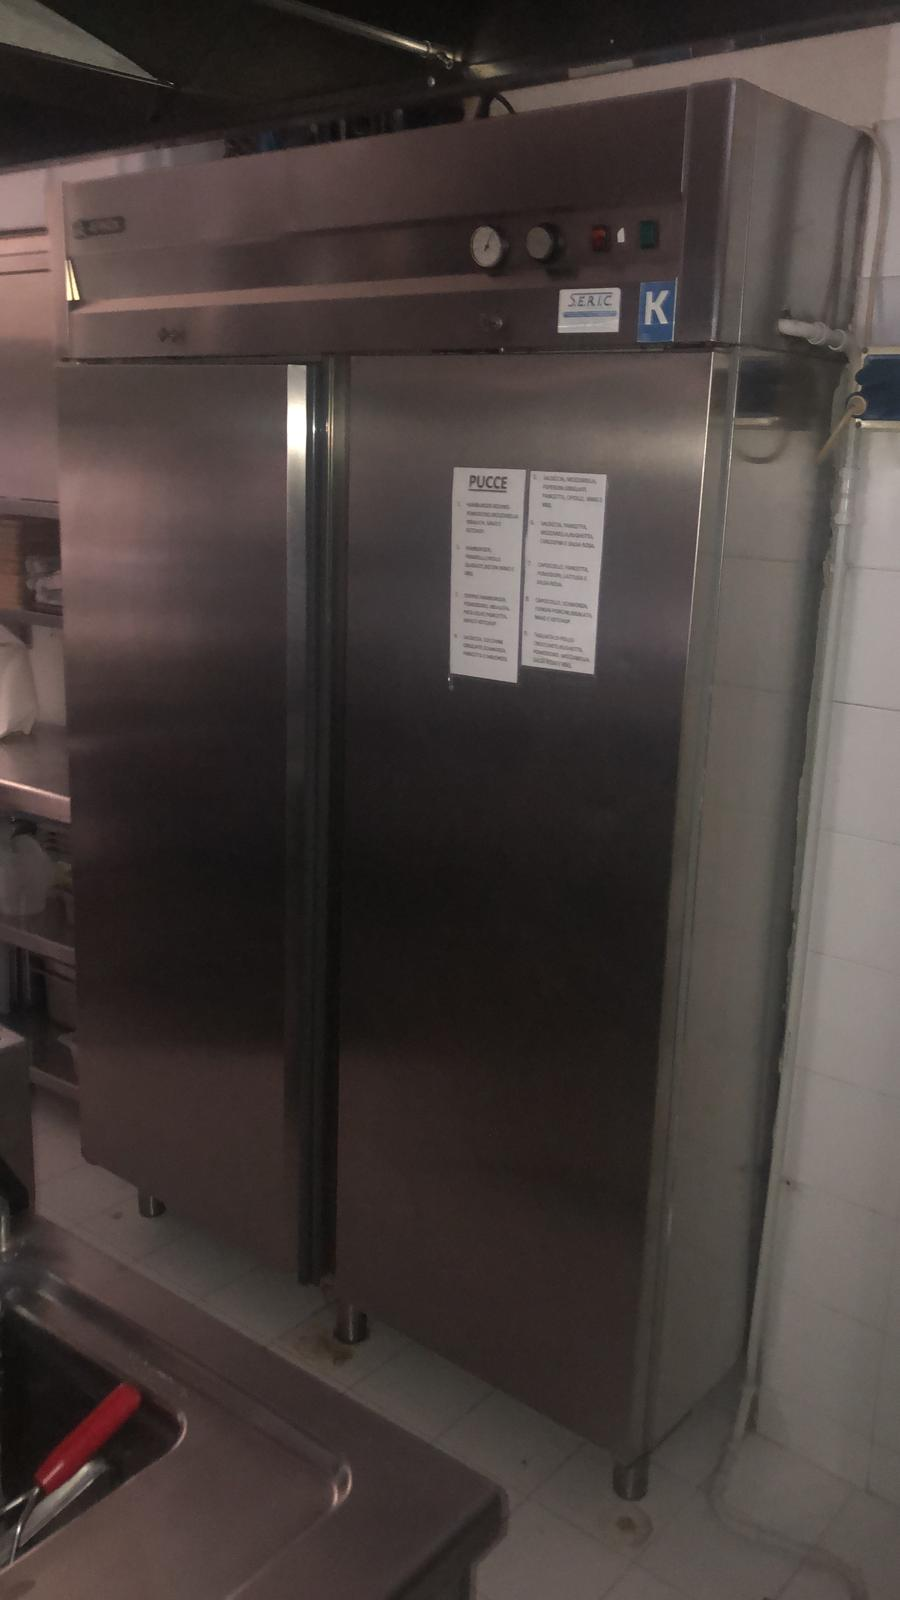 Frigo lt1400 +piastra friggitrice 4fuochi bollitor